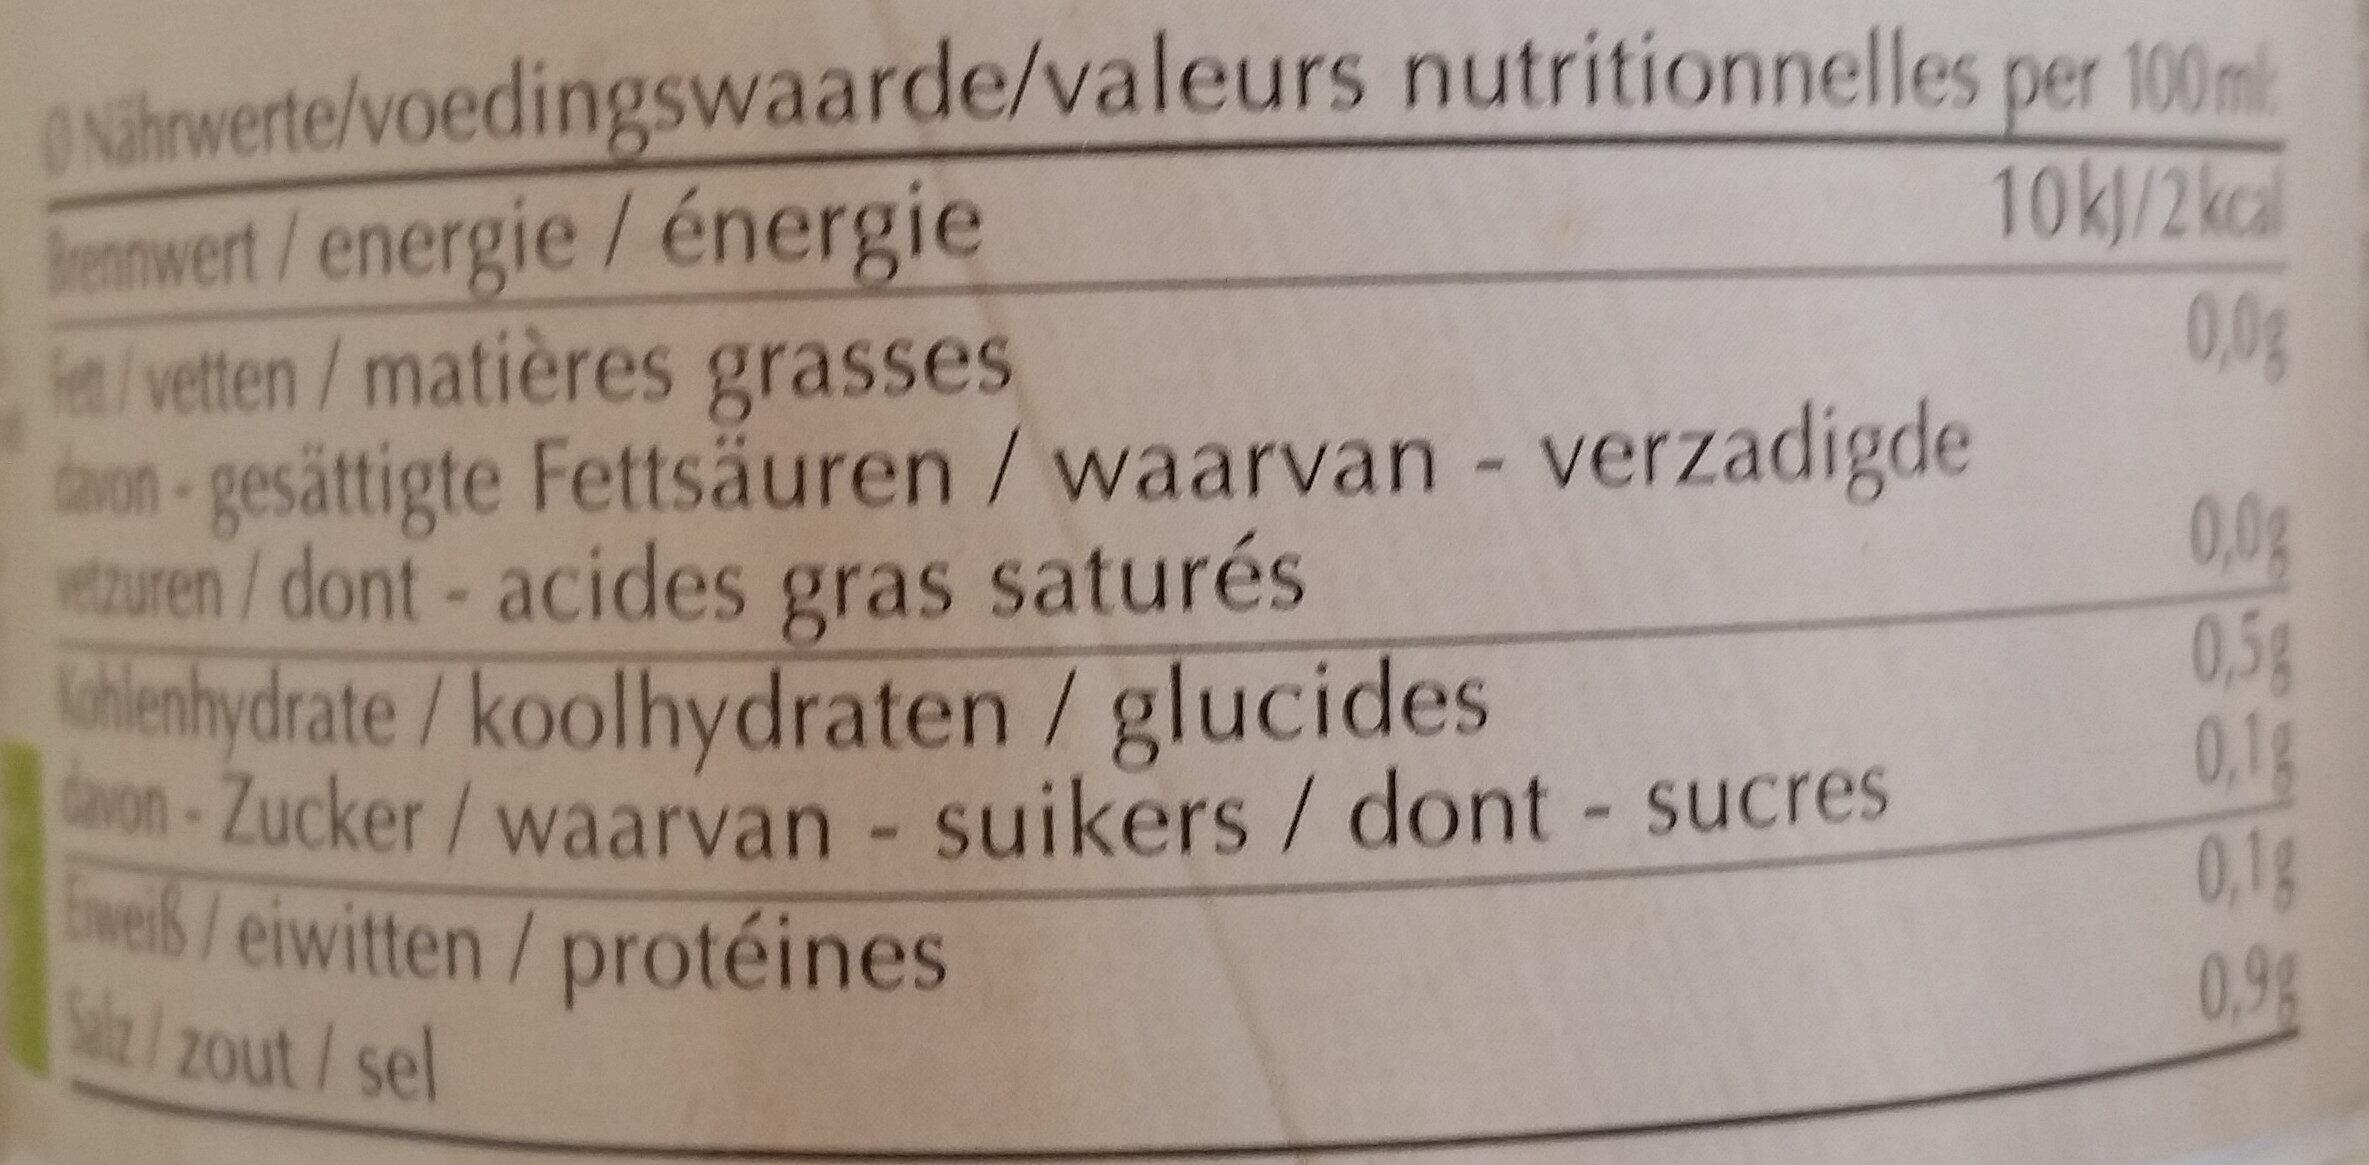 Klare Gemüsebouillon mit 15,5 % Gemüse - Información nutricional - de